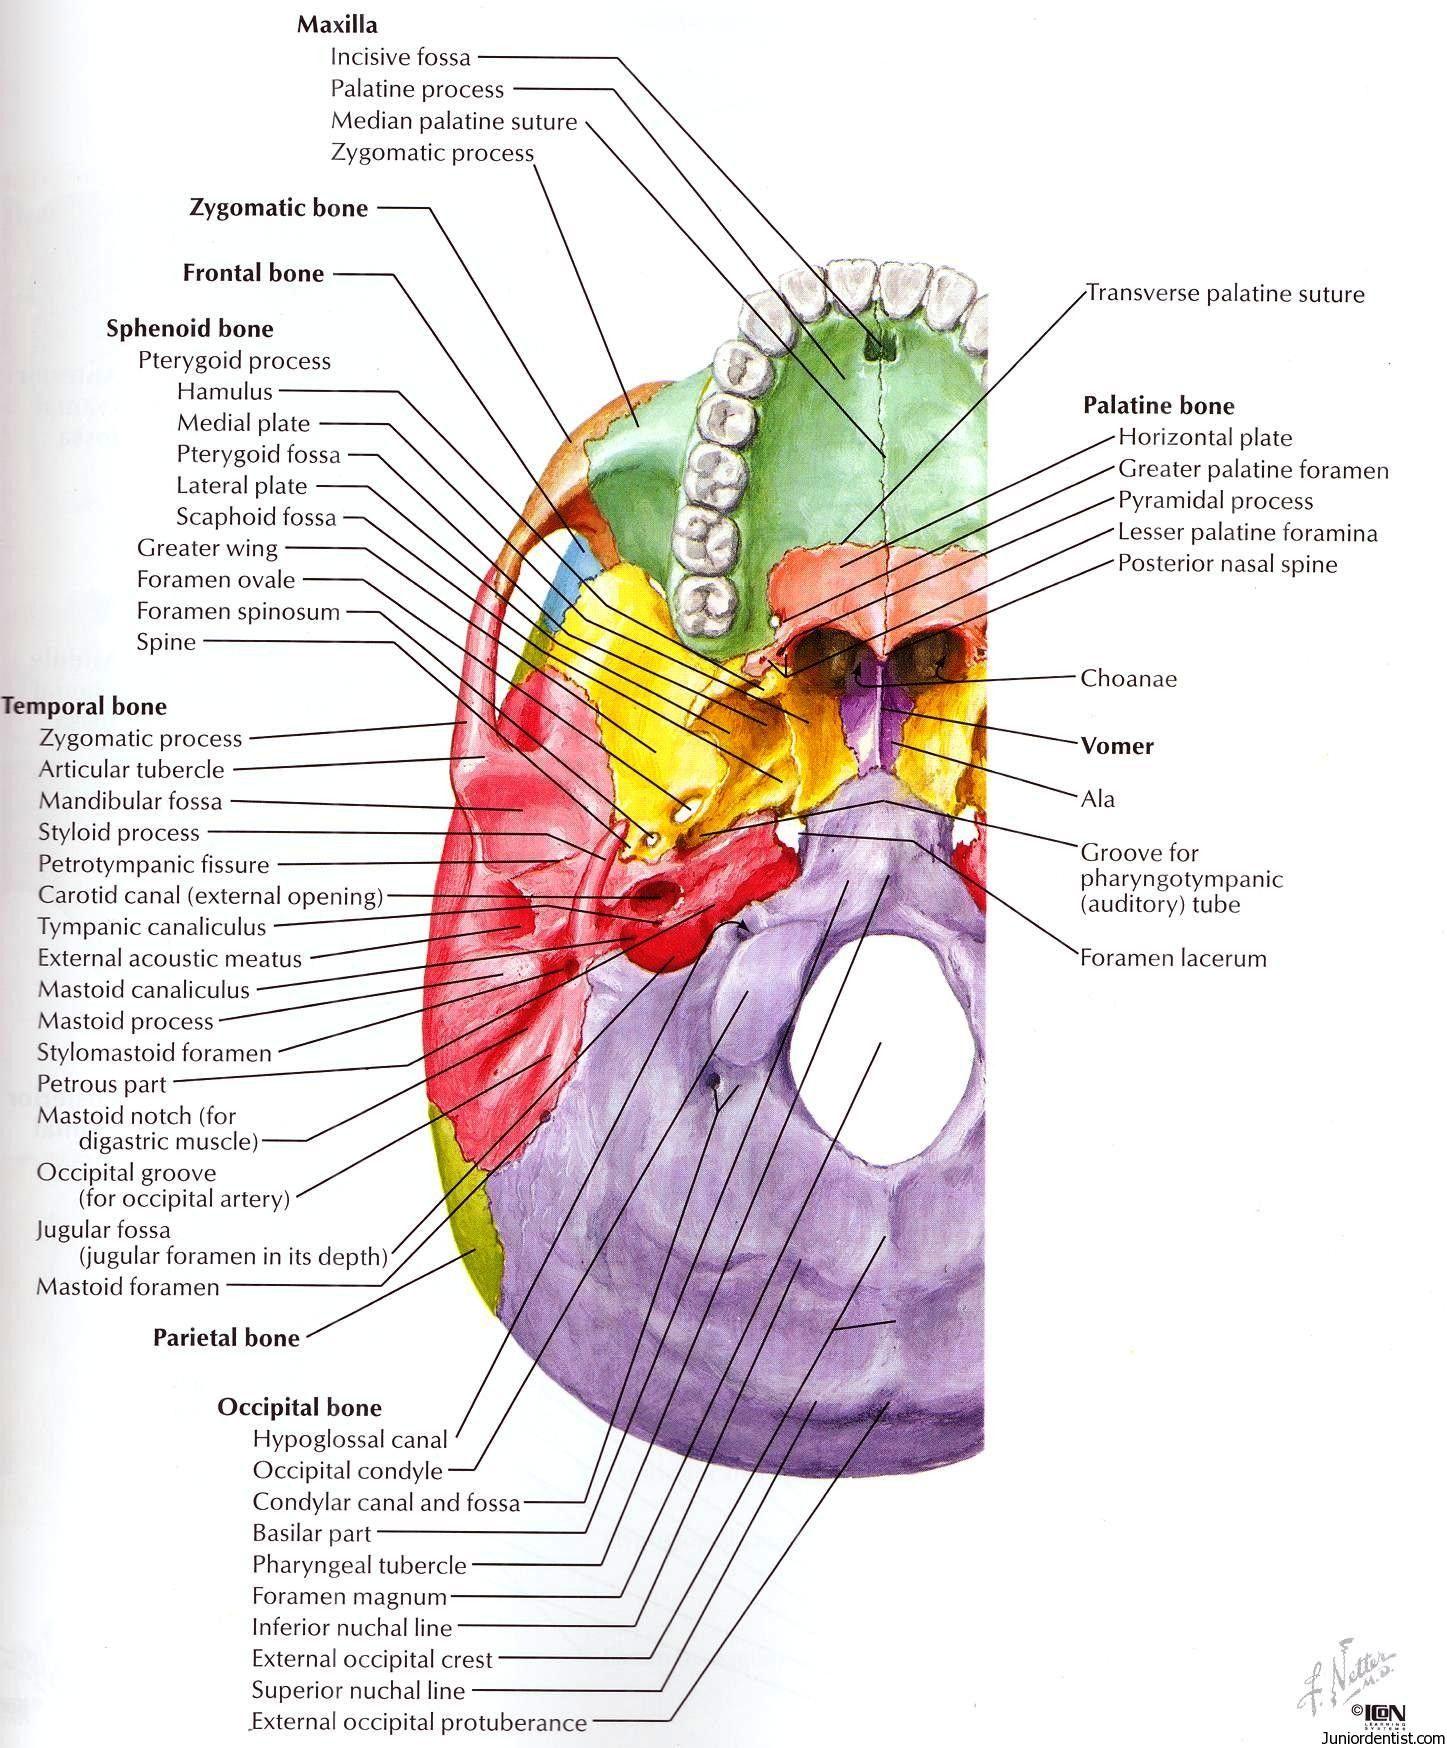 structures passing trough foramen of skull foramen of skull [ 1447 x 1748 Pixel ]